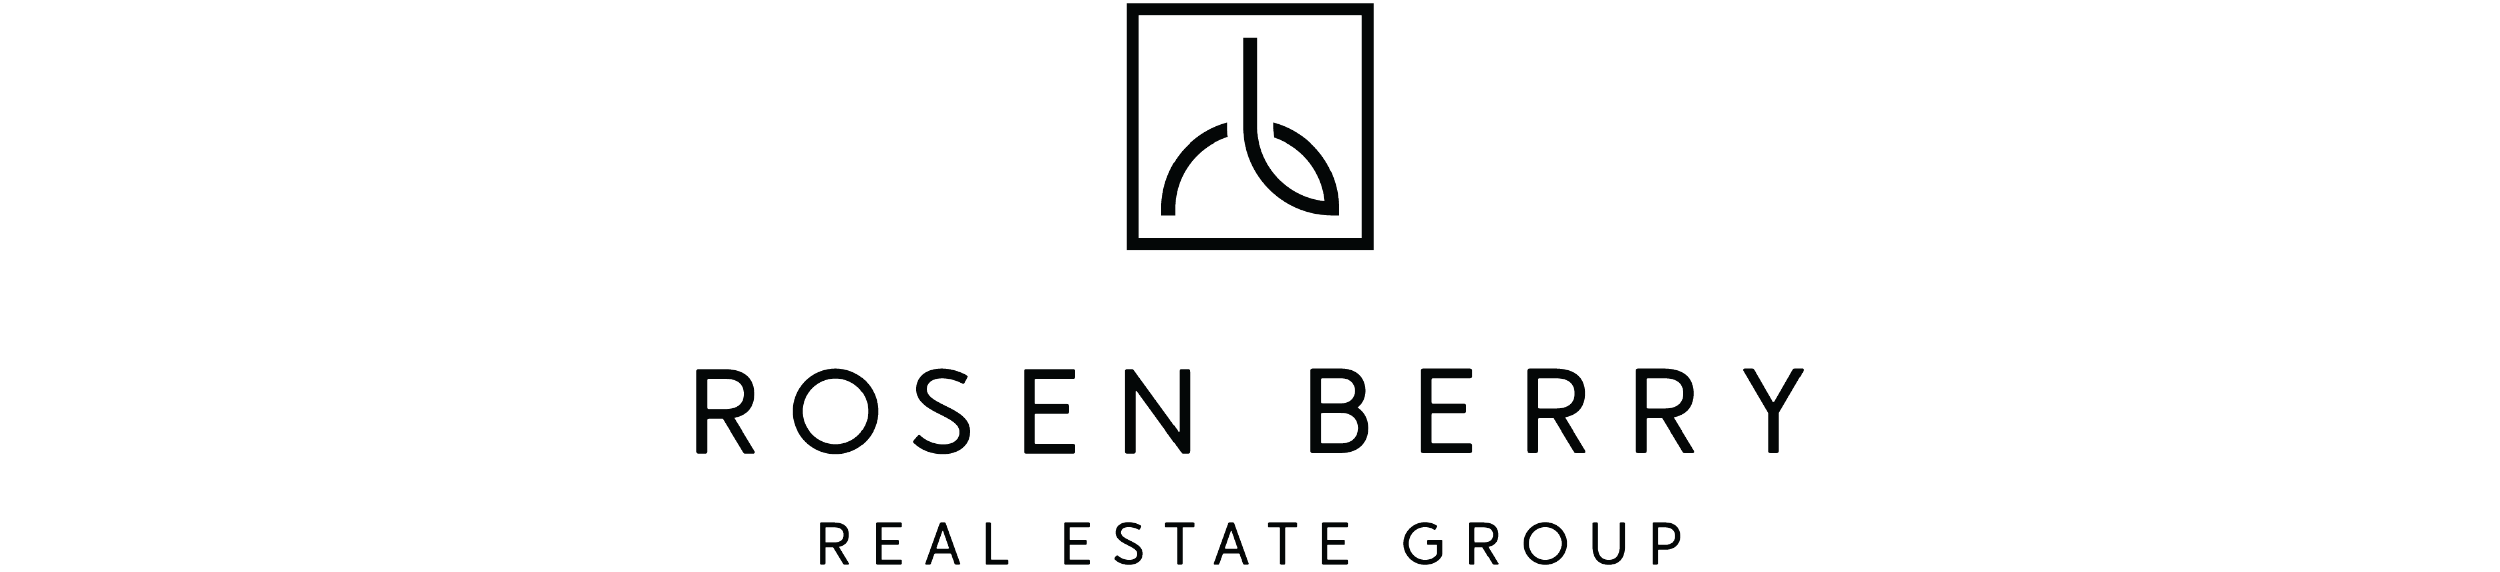 Rosen Berry Real Estate Group